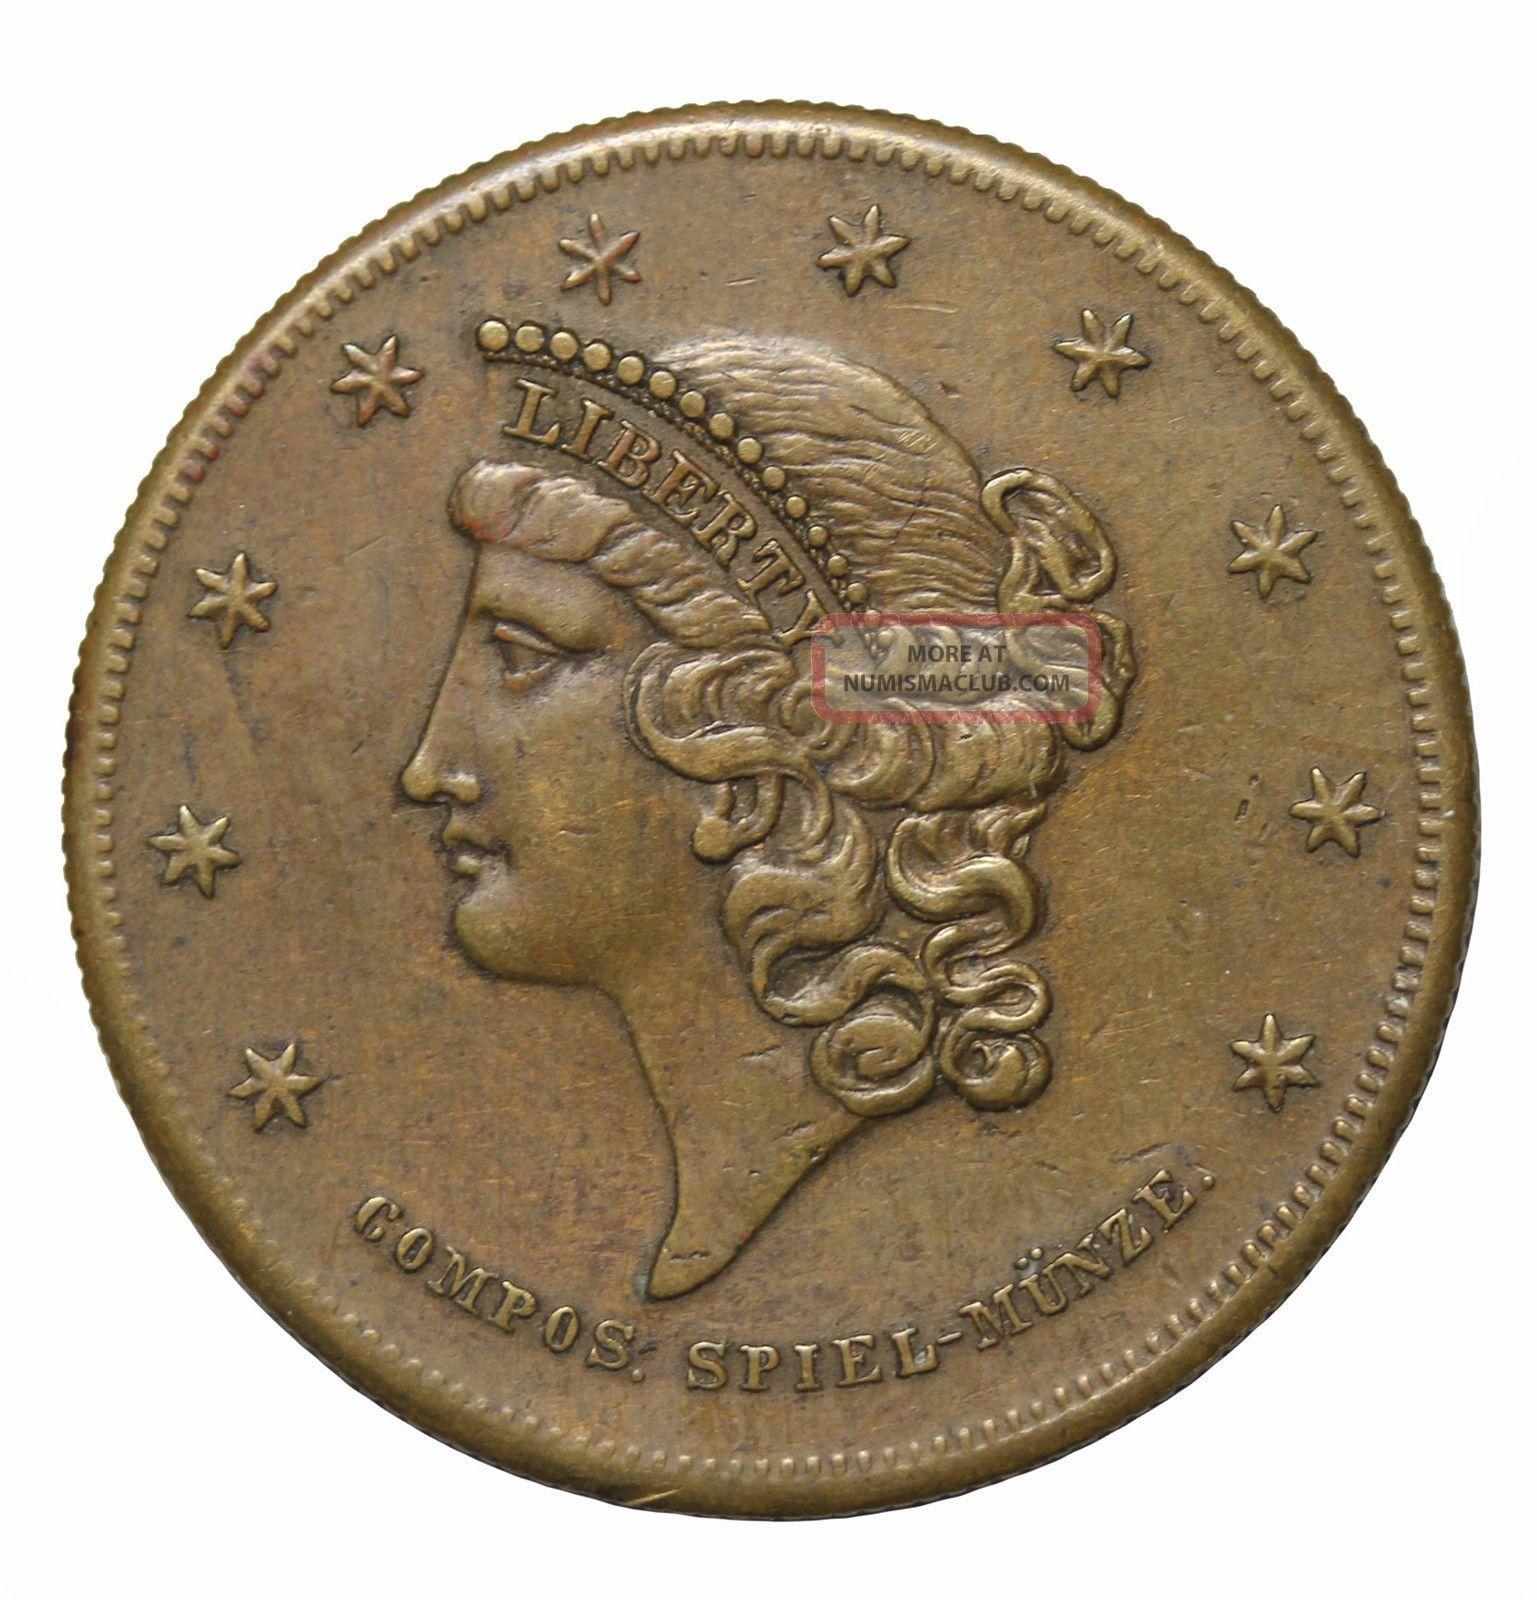 1850s Liberty $20 Gold Style In Unitate Fortitudo Spiel Marke Game Counter Token Exonumia photo